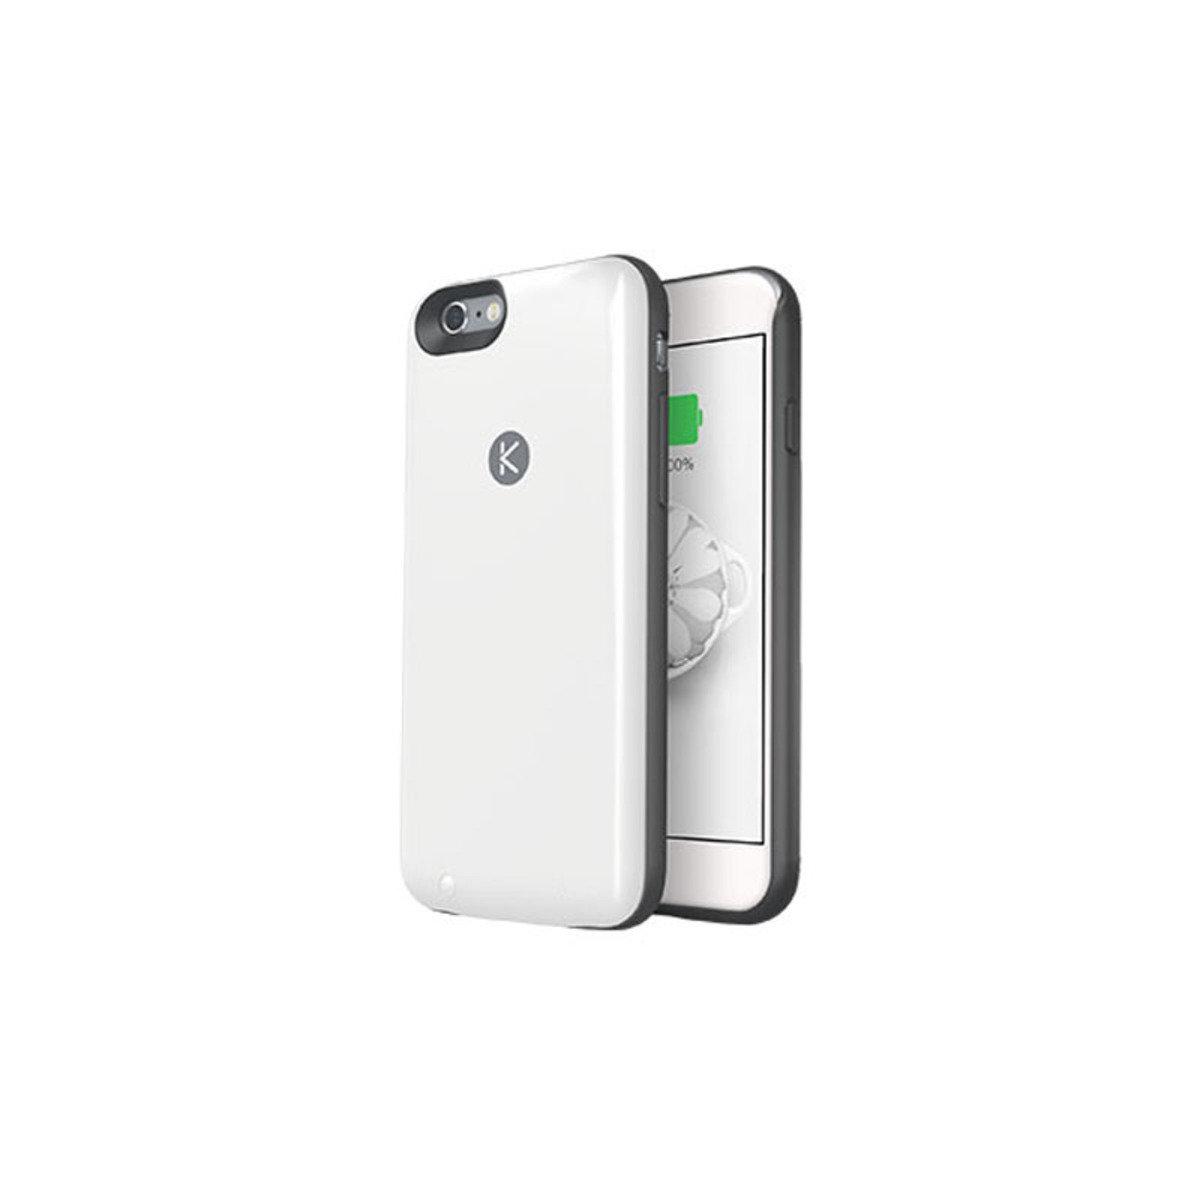 iPhone 6 / 6S 專用機殼內置16GB連2400mAh充電池 黑色+白色